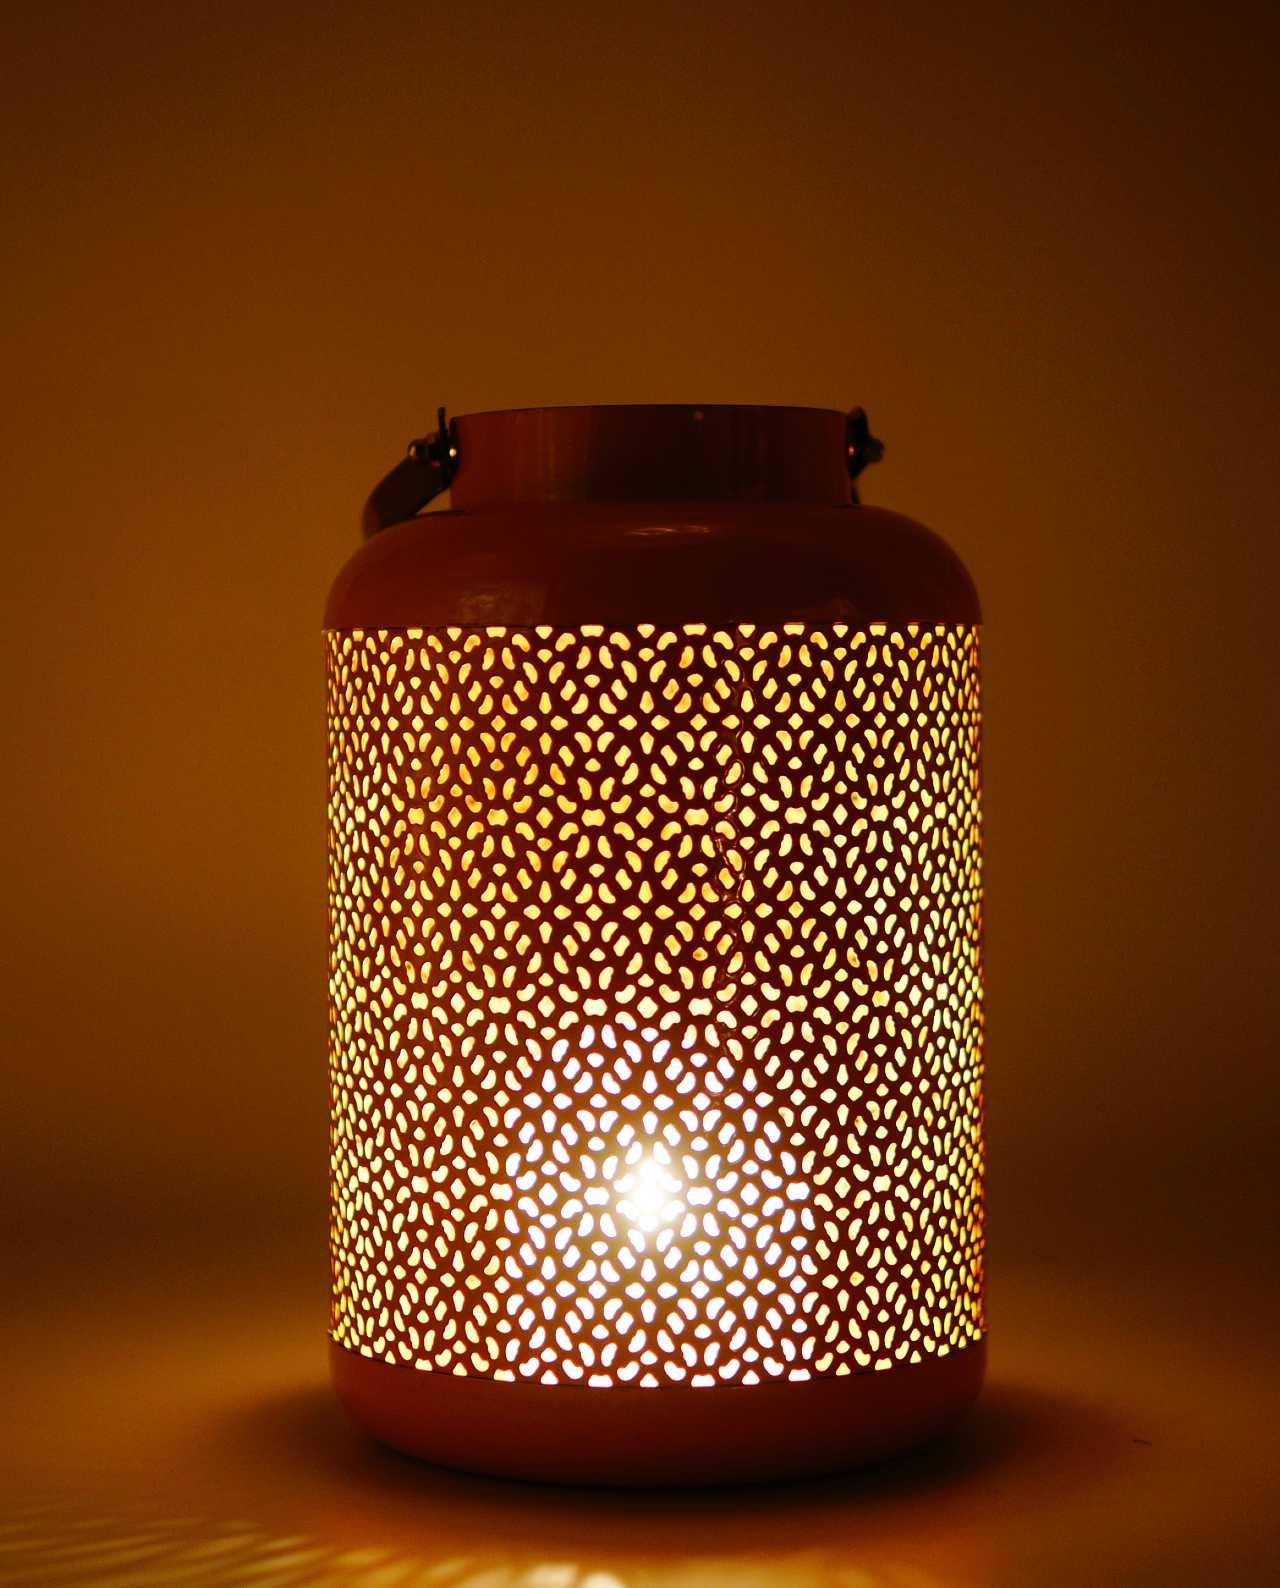 Lantern made of metal in salmon color height 24 cm, diameter 15 cm